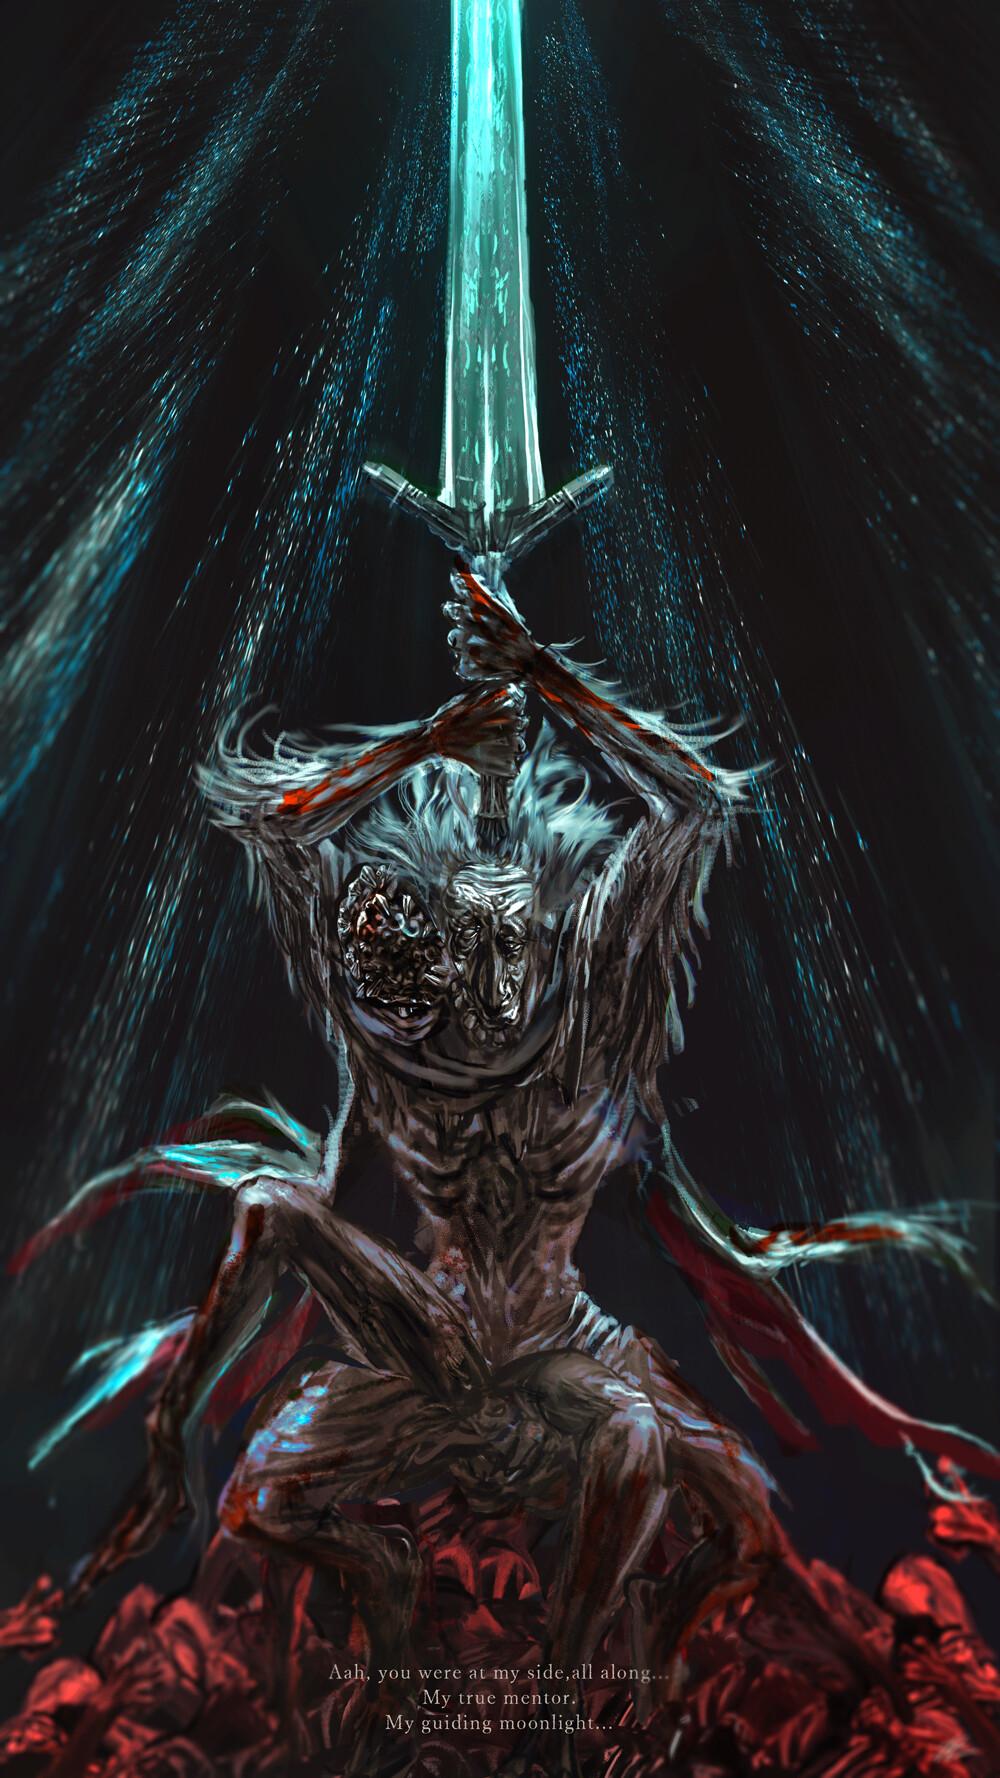 Ludwig's Holy Blade in Dark Souls 3